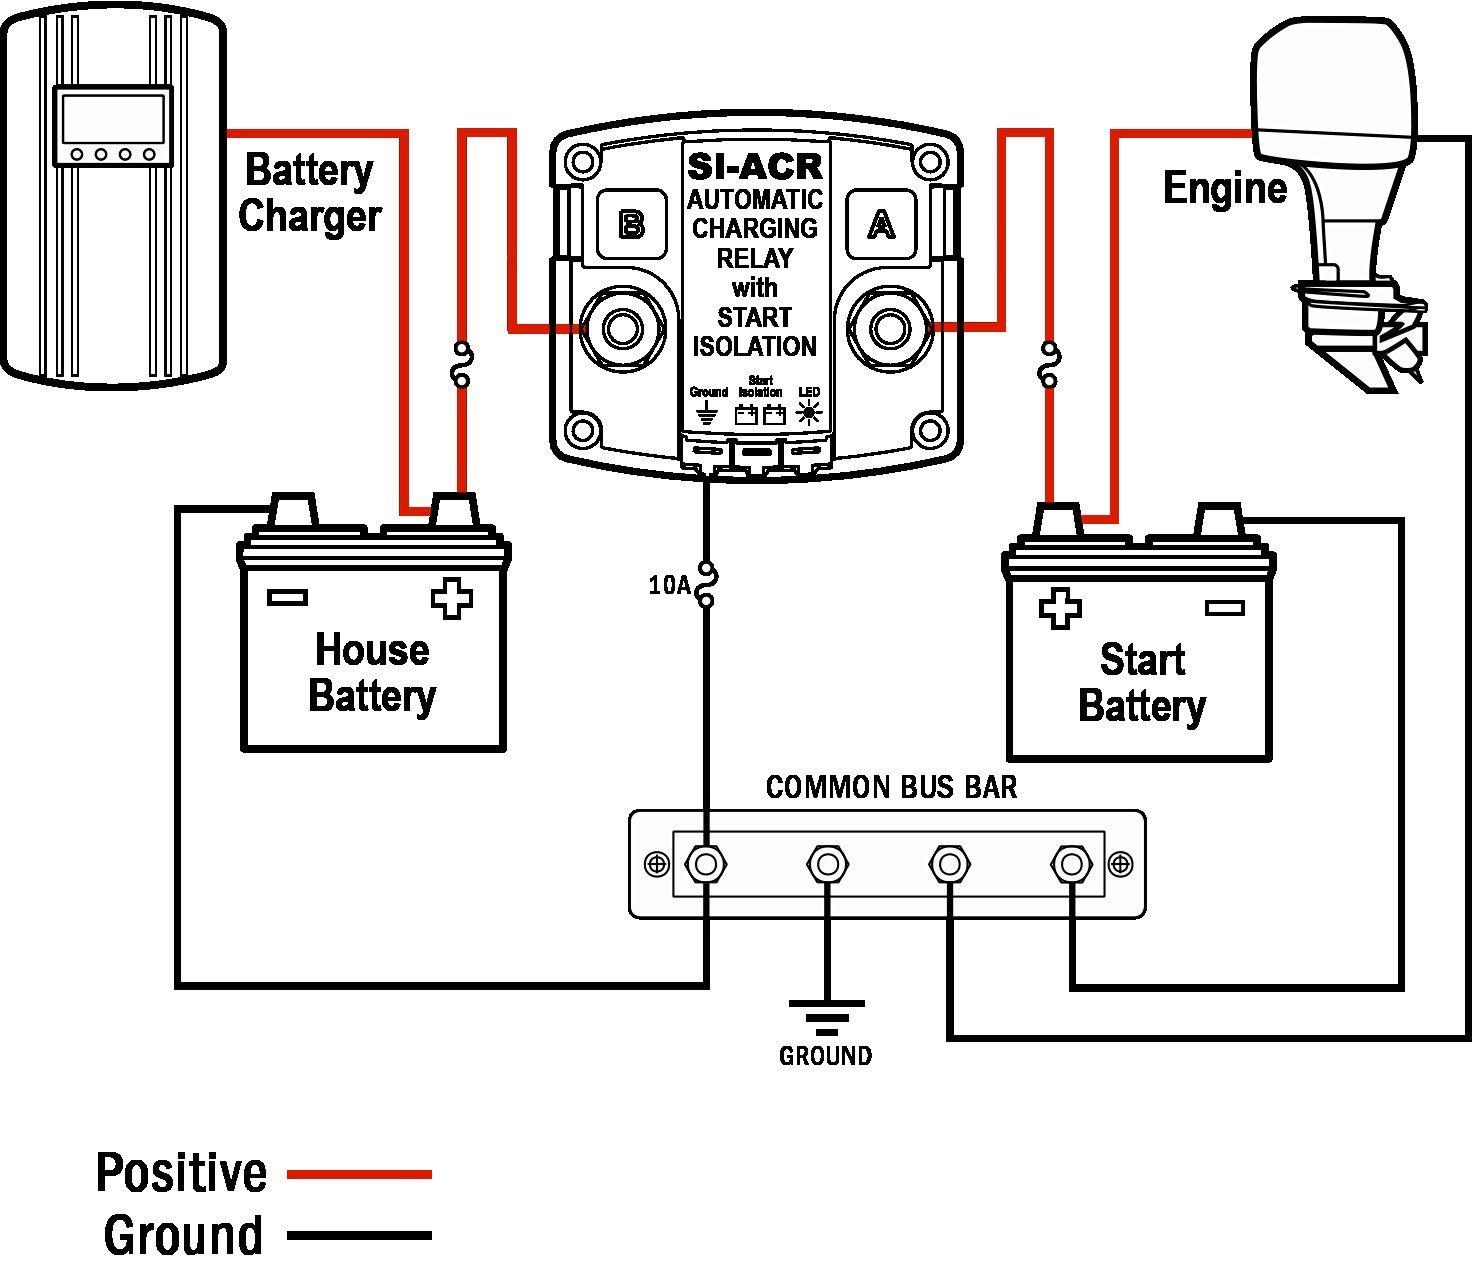 Elegant Marine Bus Bar Wiring Diagram Boat Wiring Trolling Motor Diagram